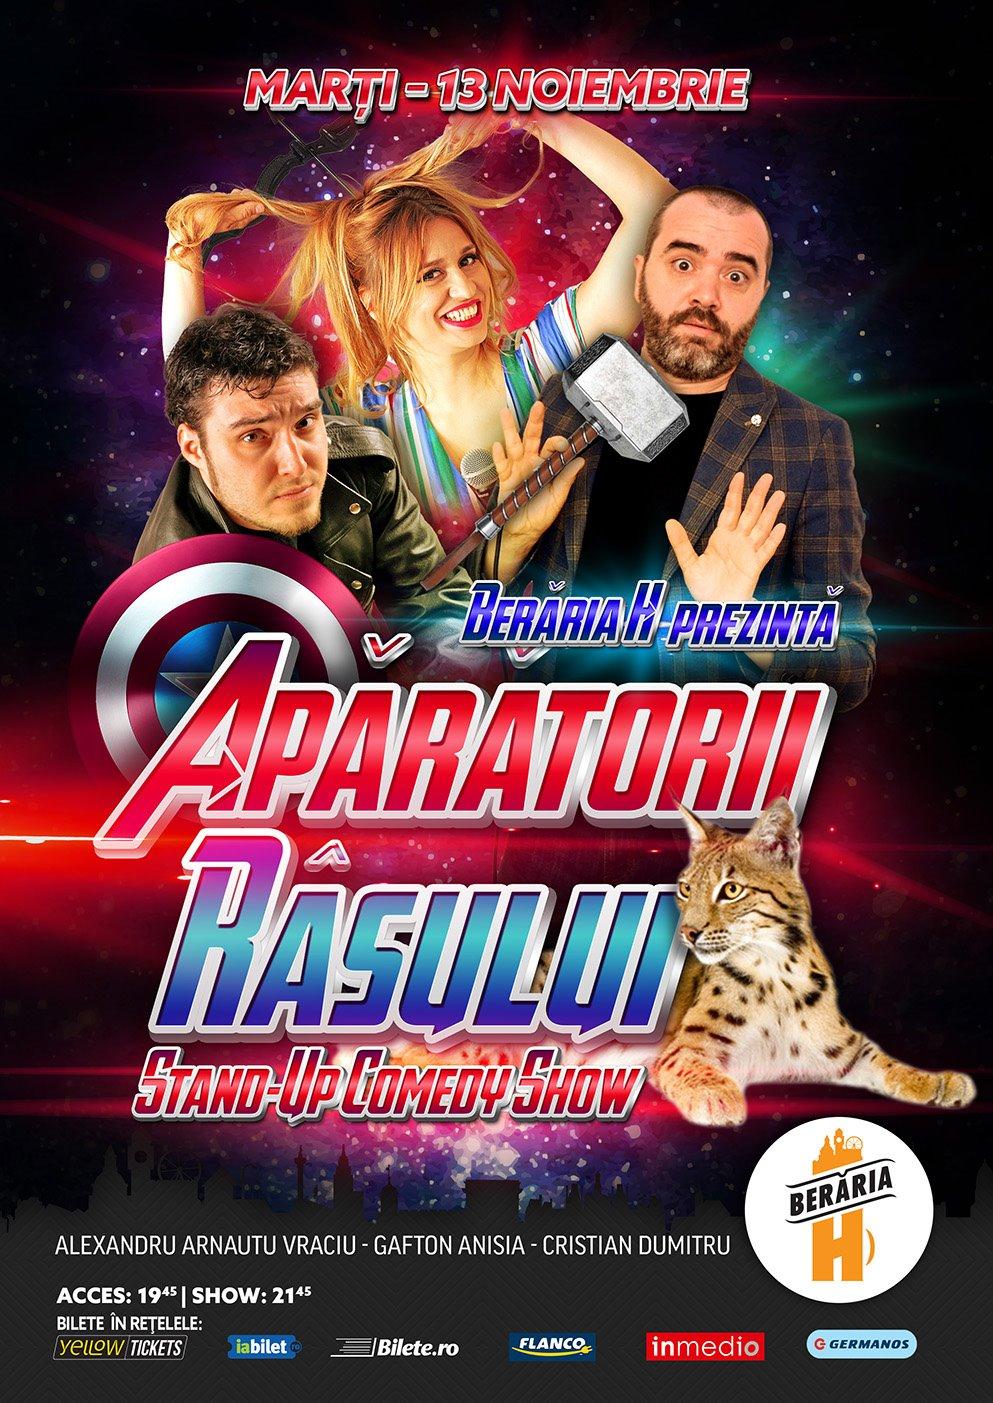 Stand-Up Comedy Bucuresti Marti 13 Noiembrie la Beraria H